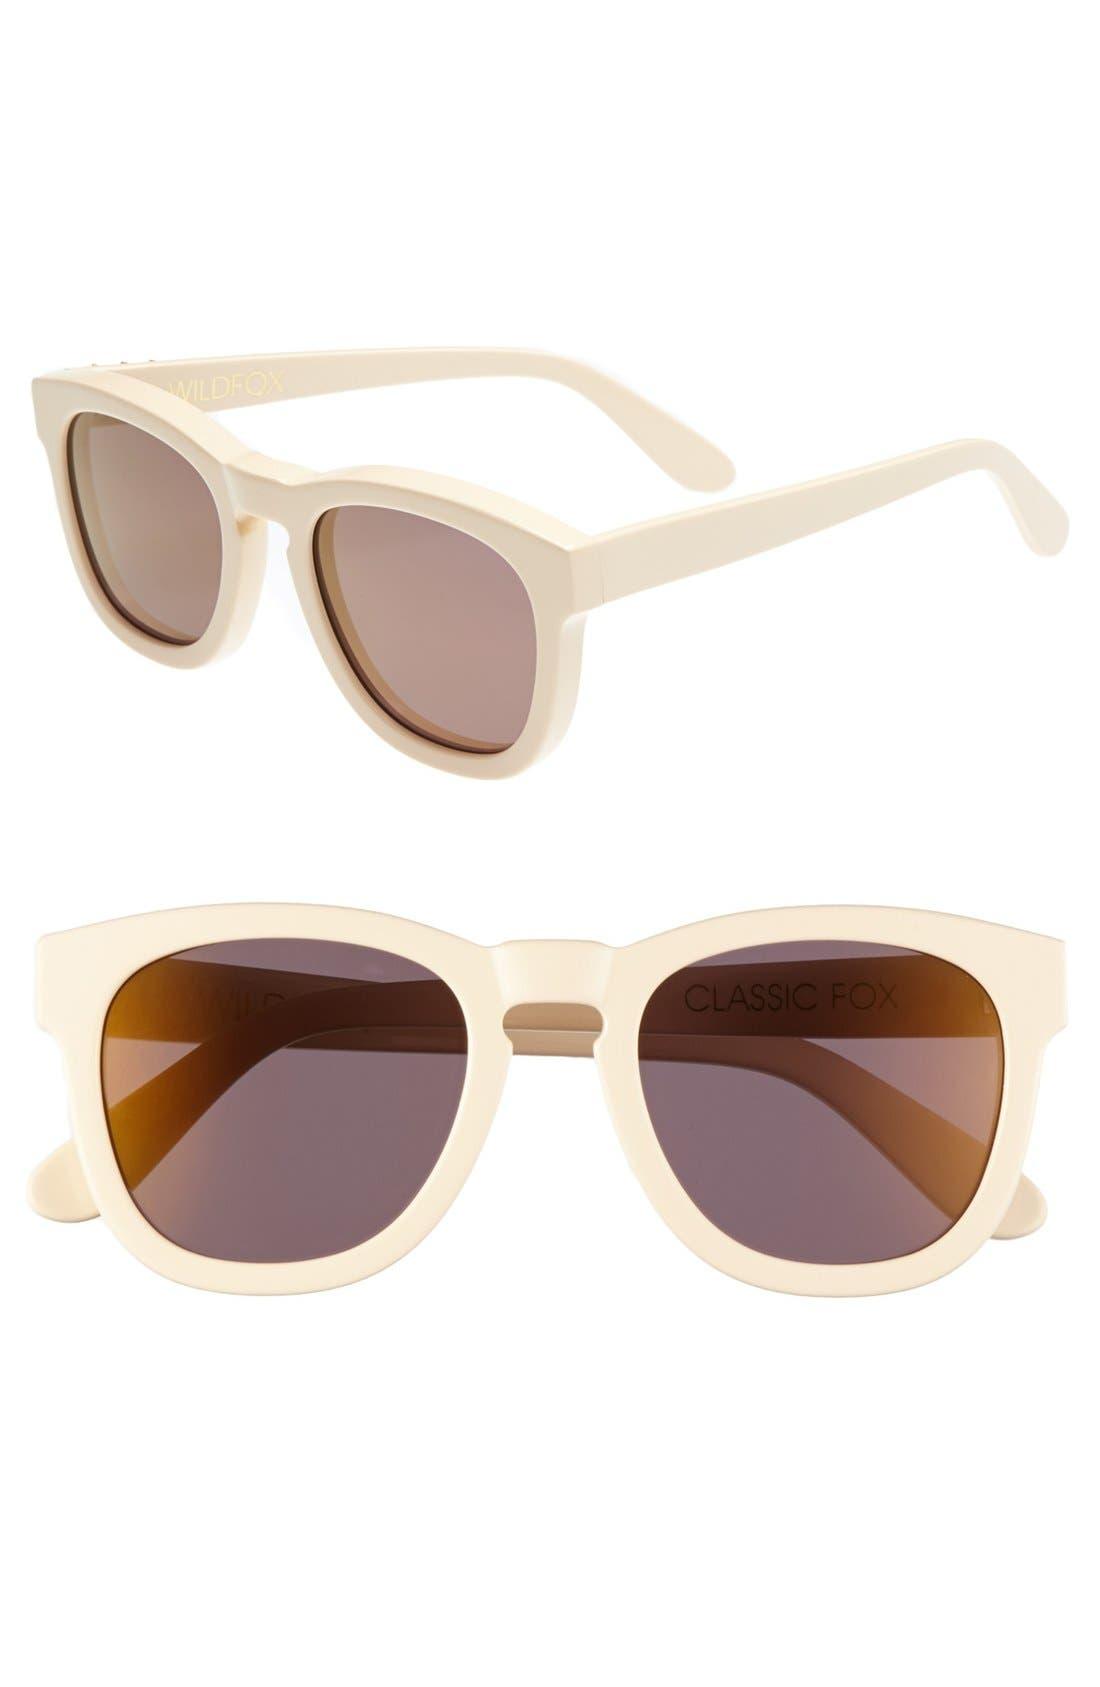 Main Image - Wildfox 'Classic Fox - Deluxe' 52mm Sunglasses